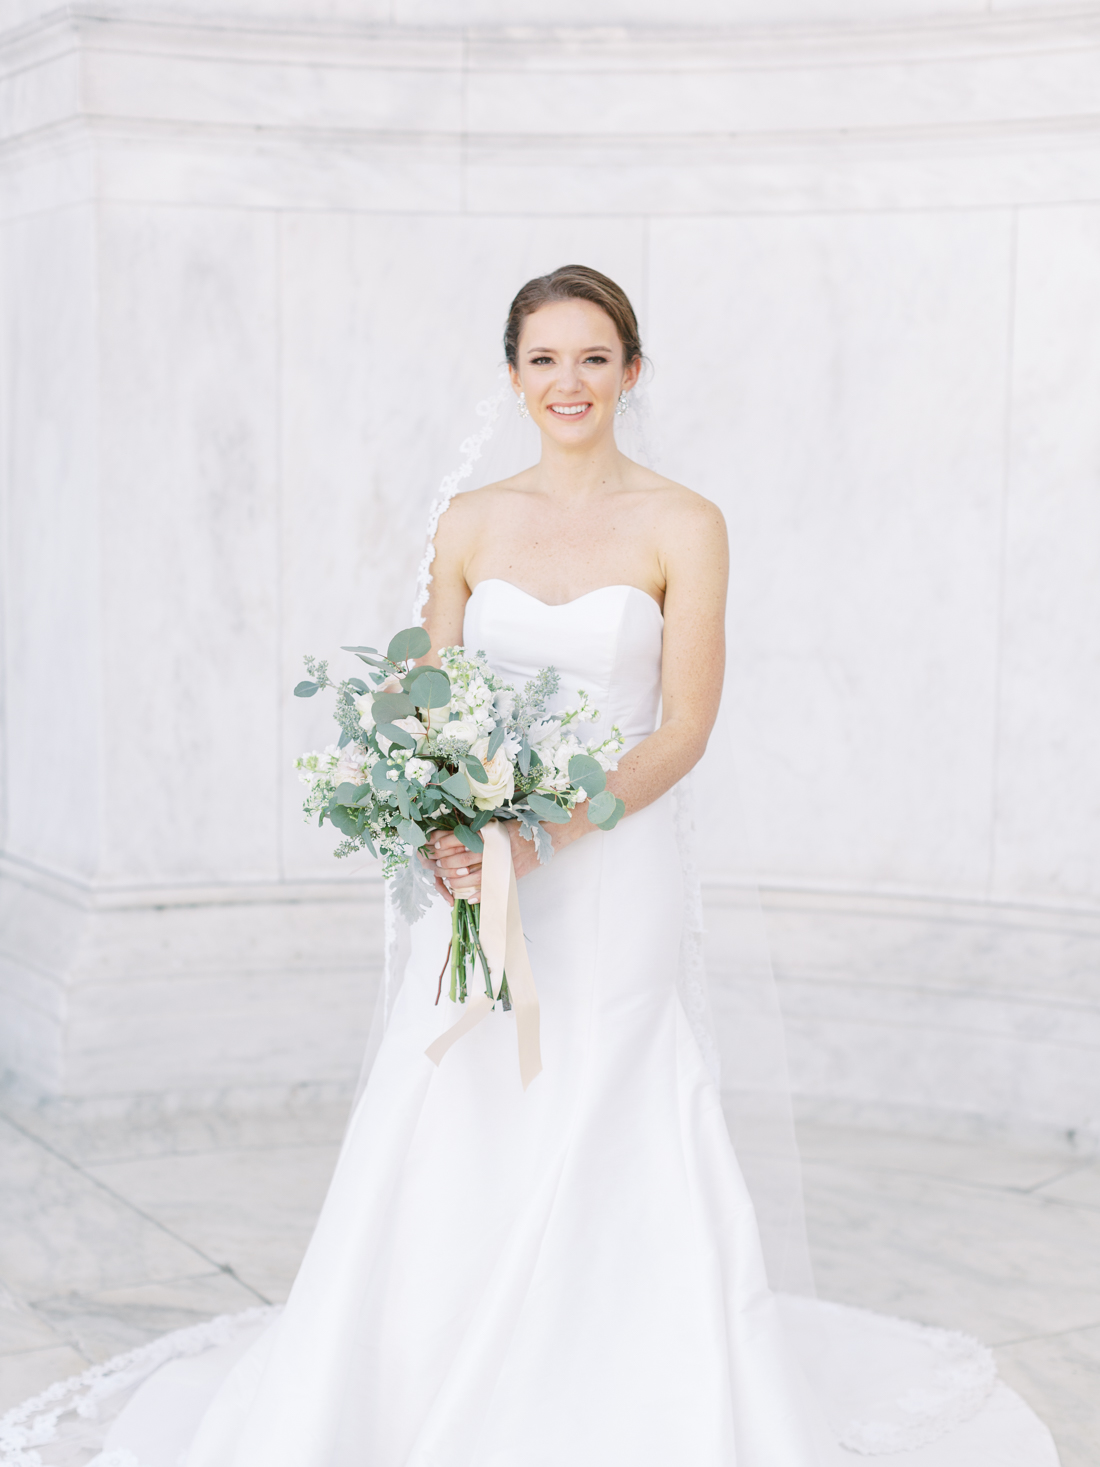 dc-wedding-photographer-michelle-whitley-jefferson-memorial